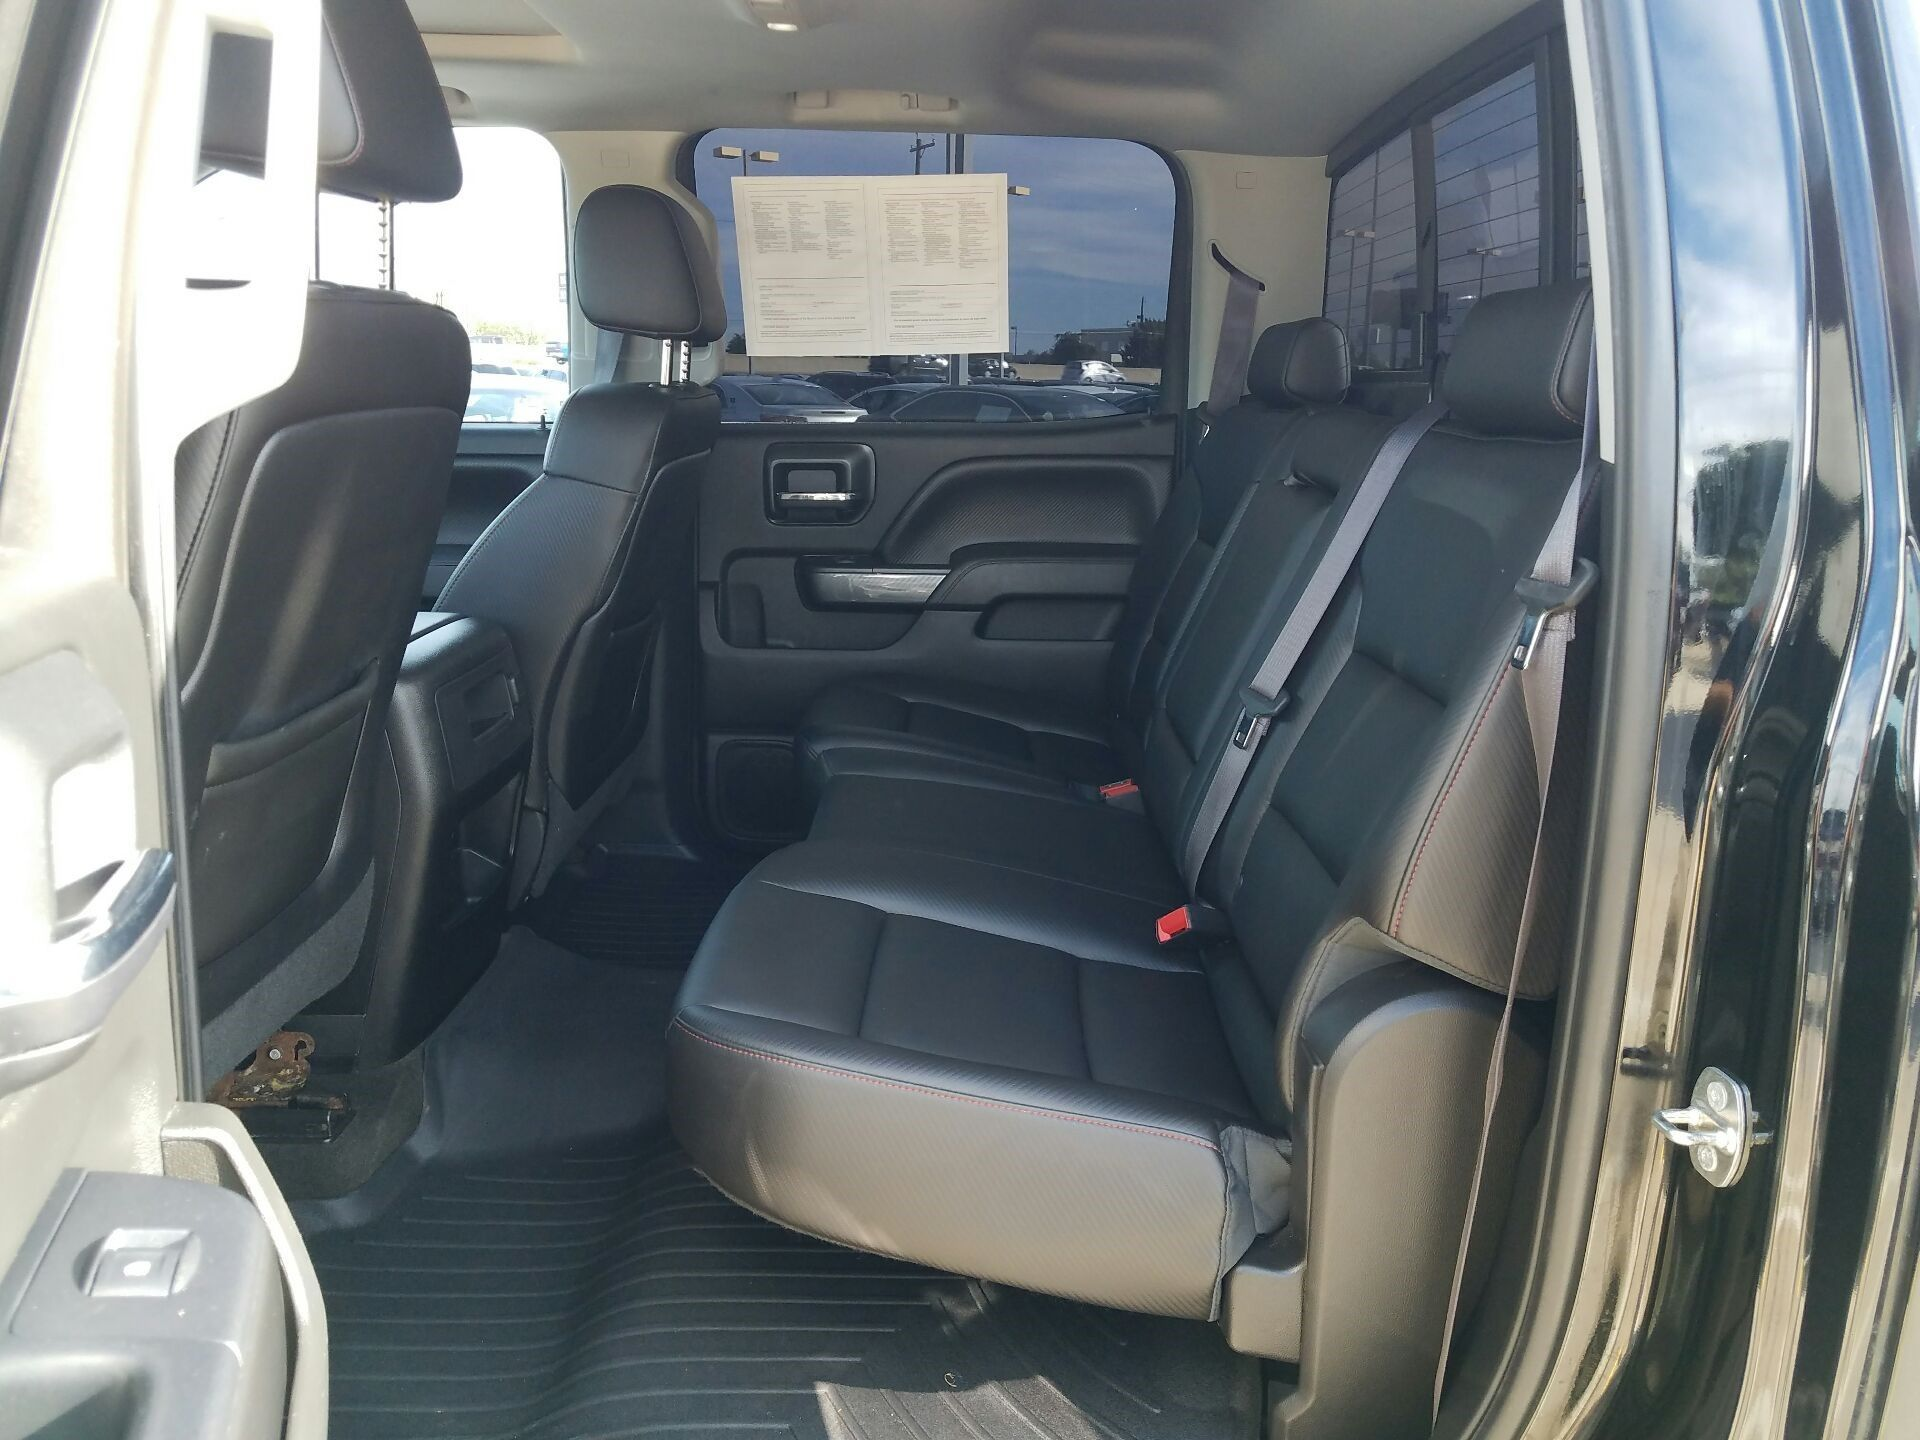 Used 2015 Gmc Sierra 2500 In Houston Texas Carmax Sierra 2500